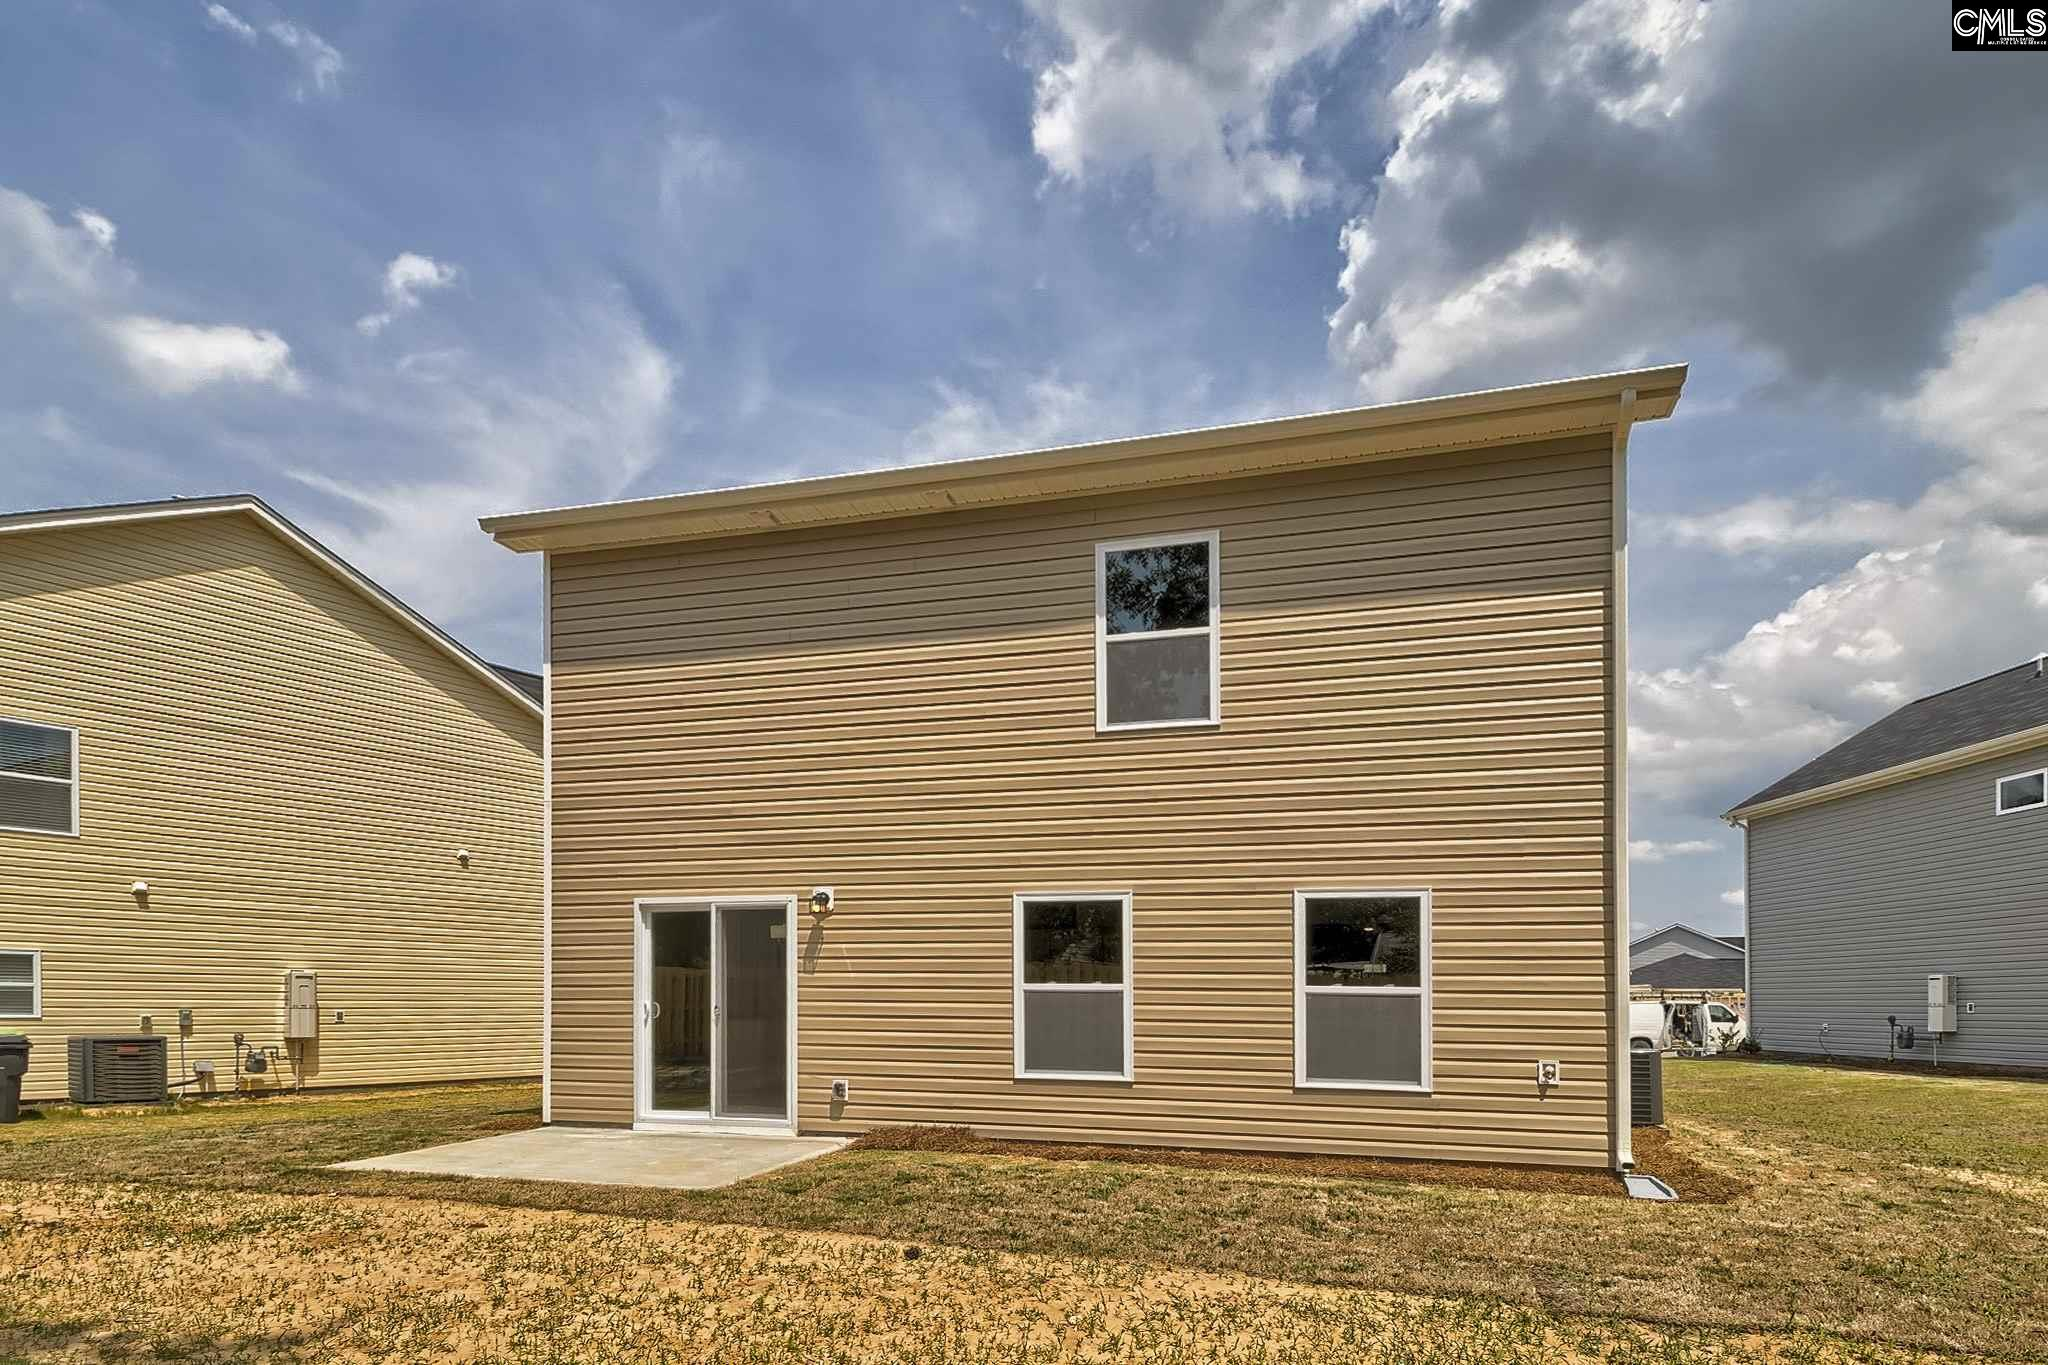 208 Olde Farm Lexington, SC 29072